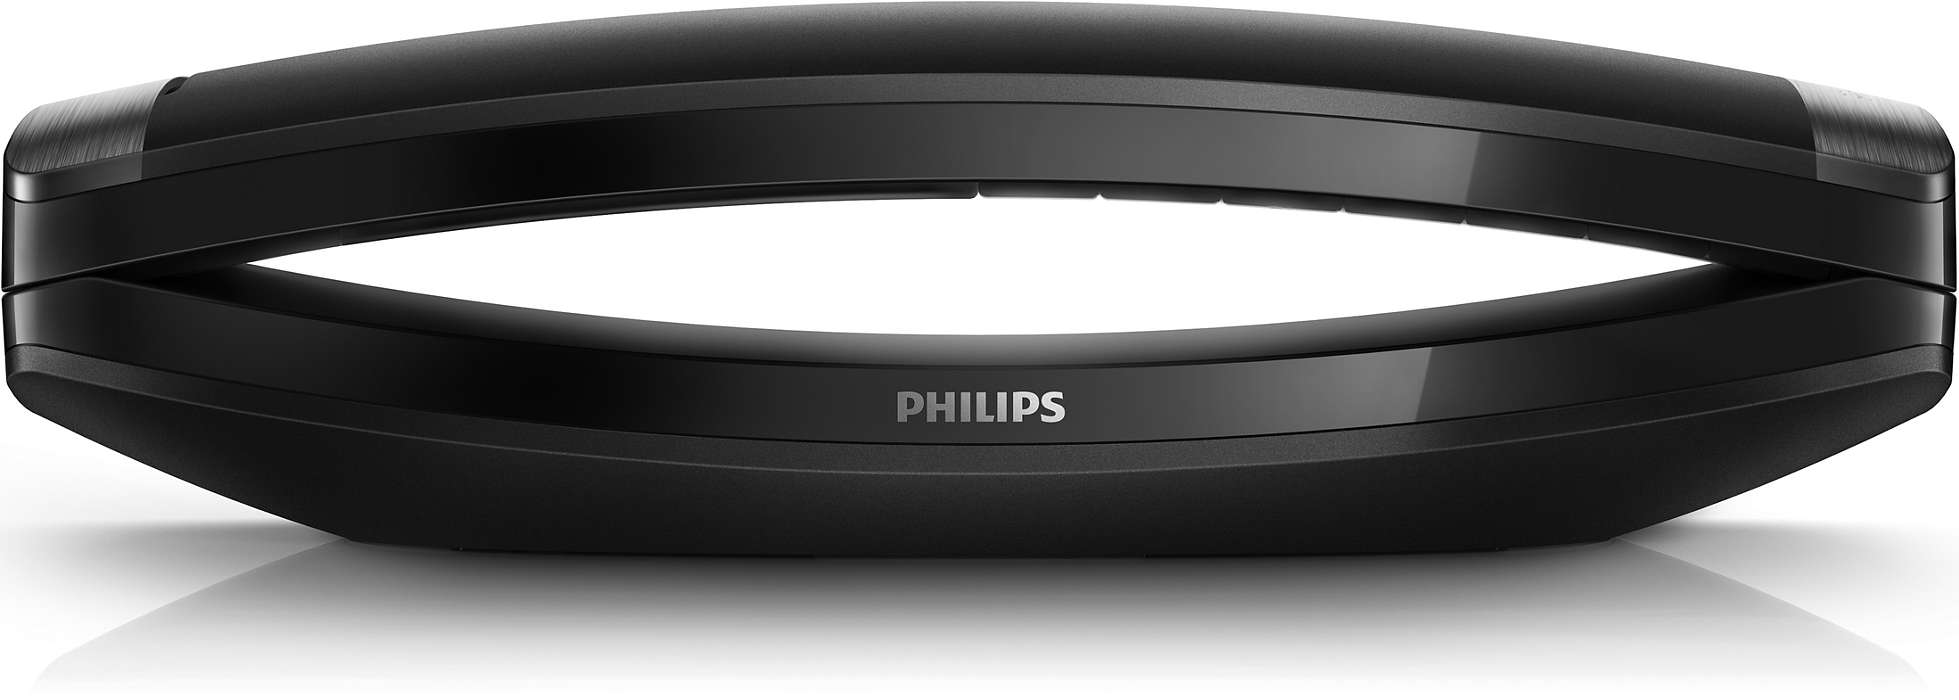 Design cordless phone M8881B/90 | Philips